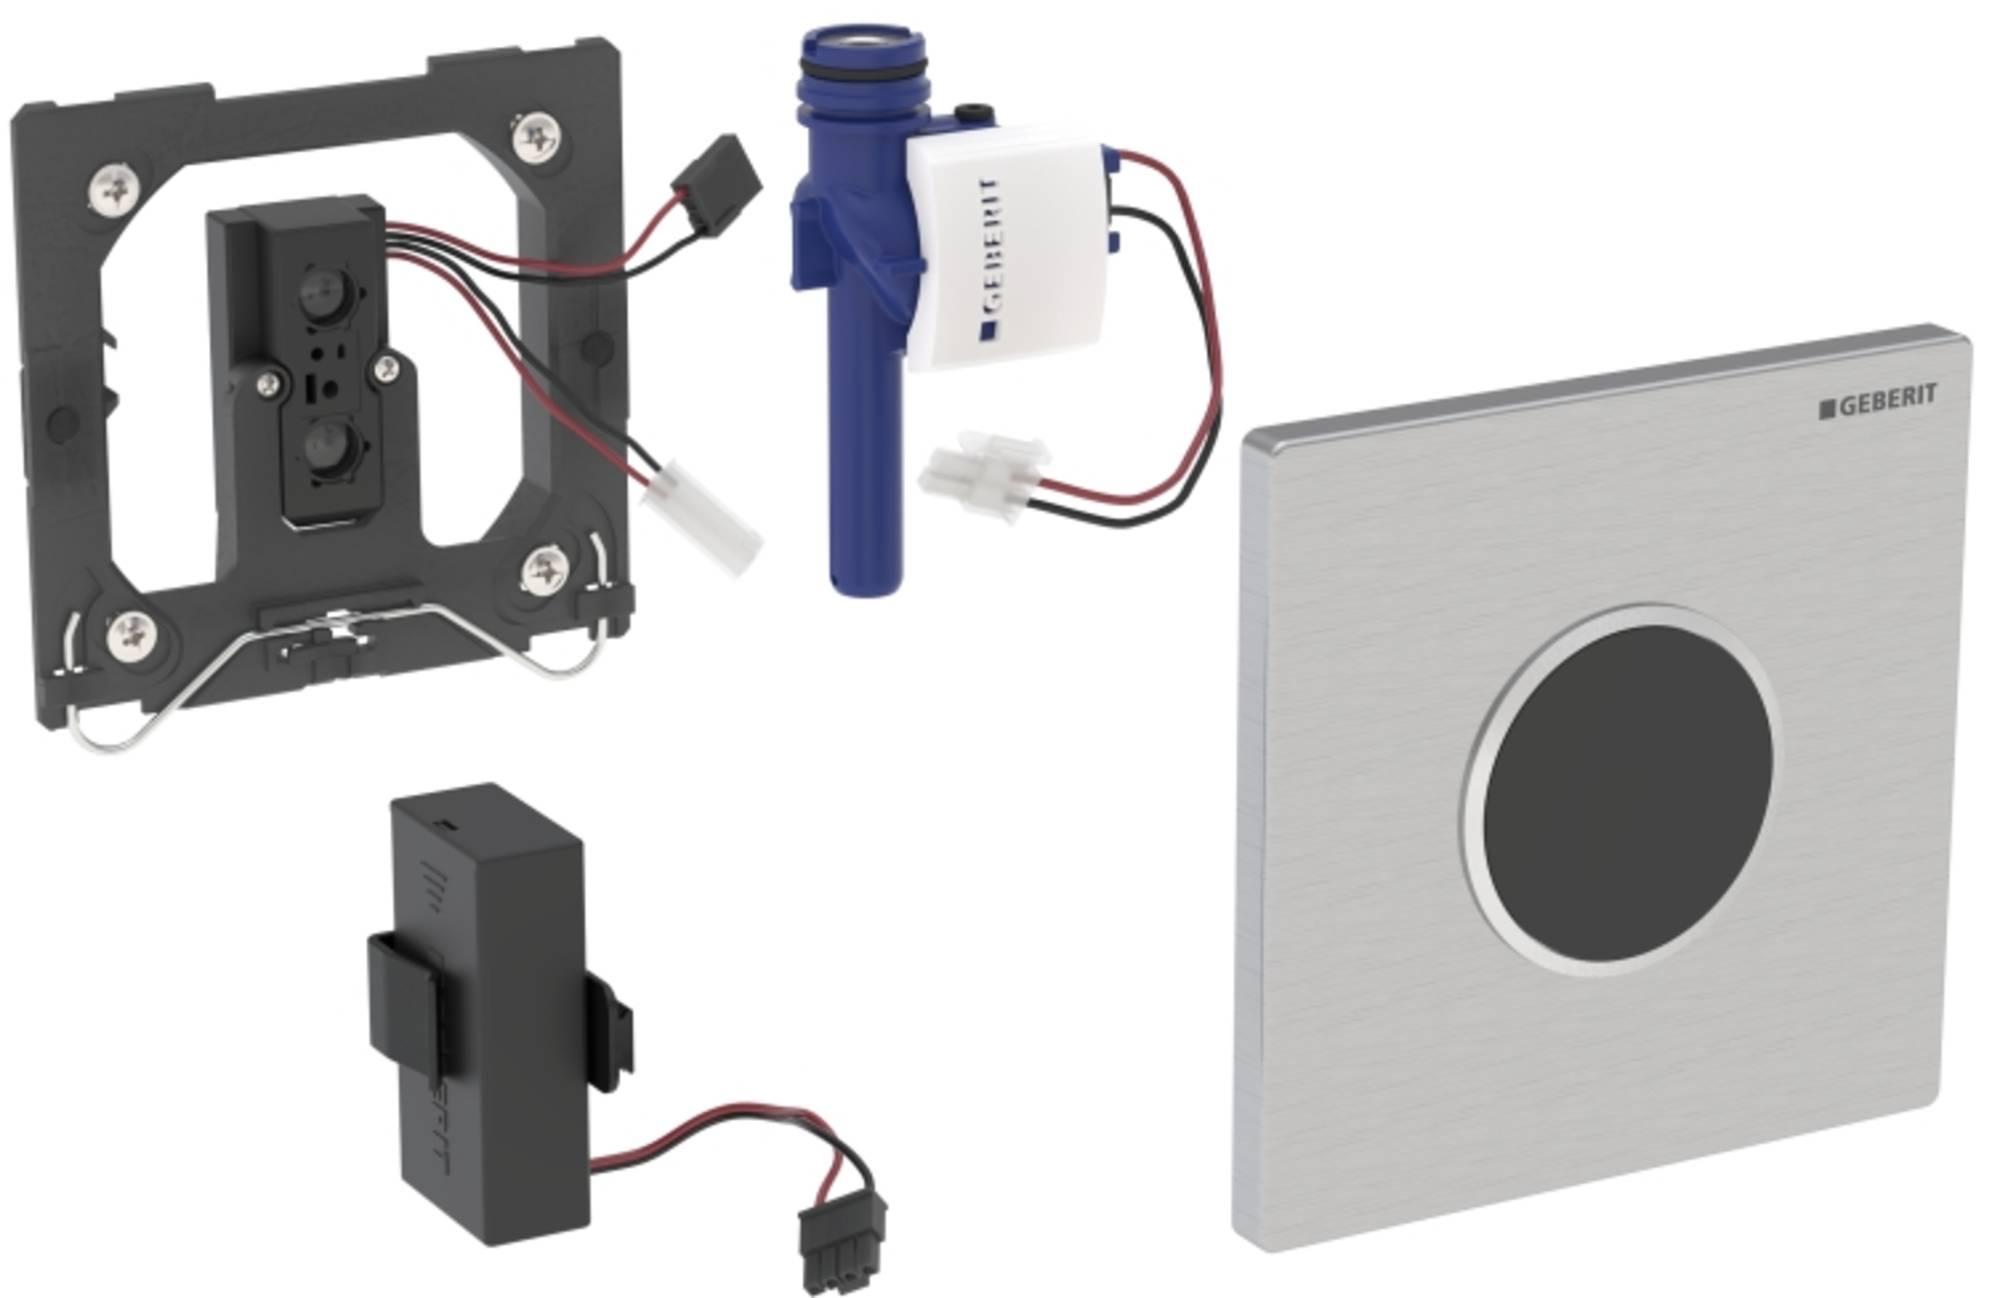 GEBERIT SIGMA10 bedieningsplaat infrarood batterij RVS GEBORSTELD (116035SN1)